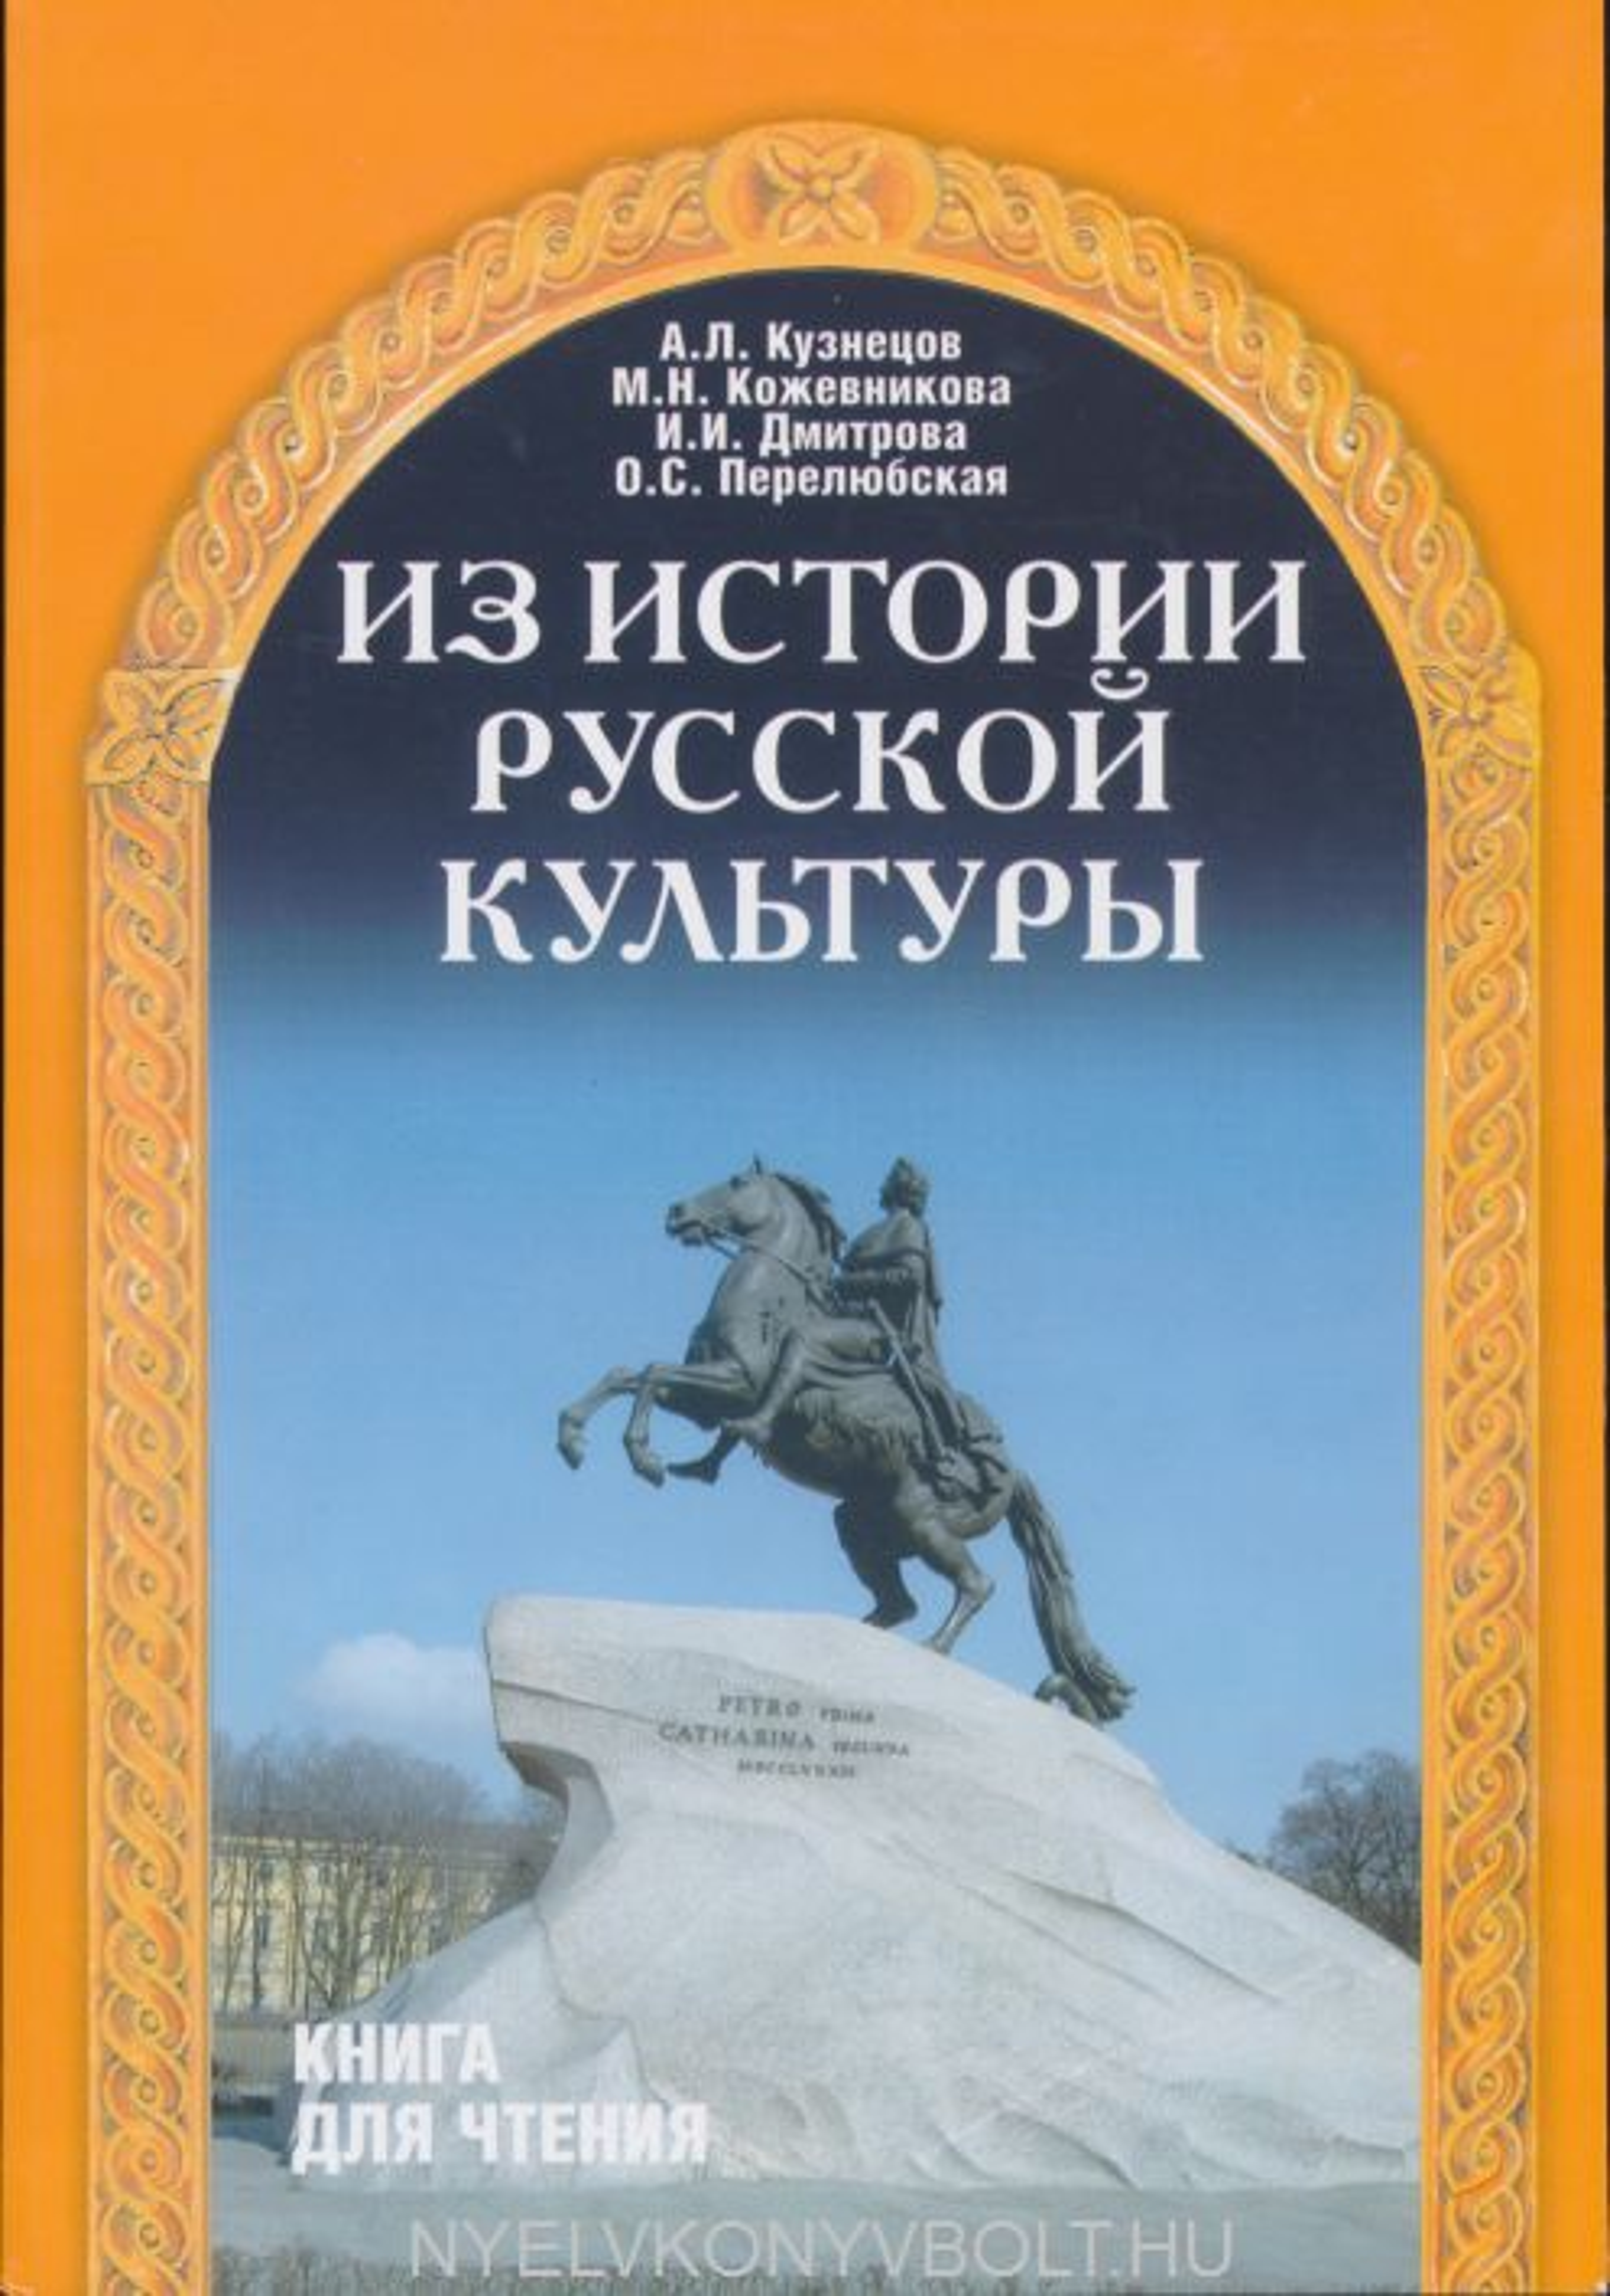 Iz istorii russkoj kultury